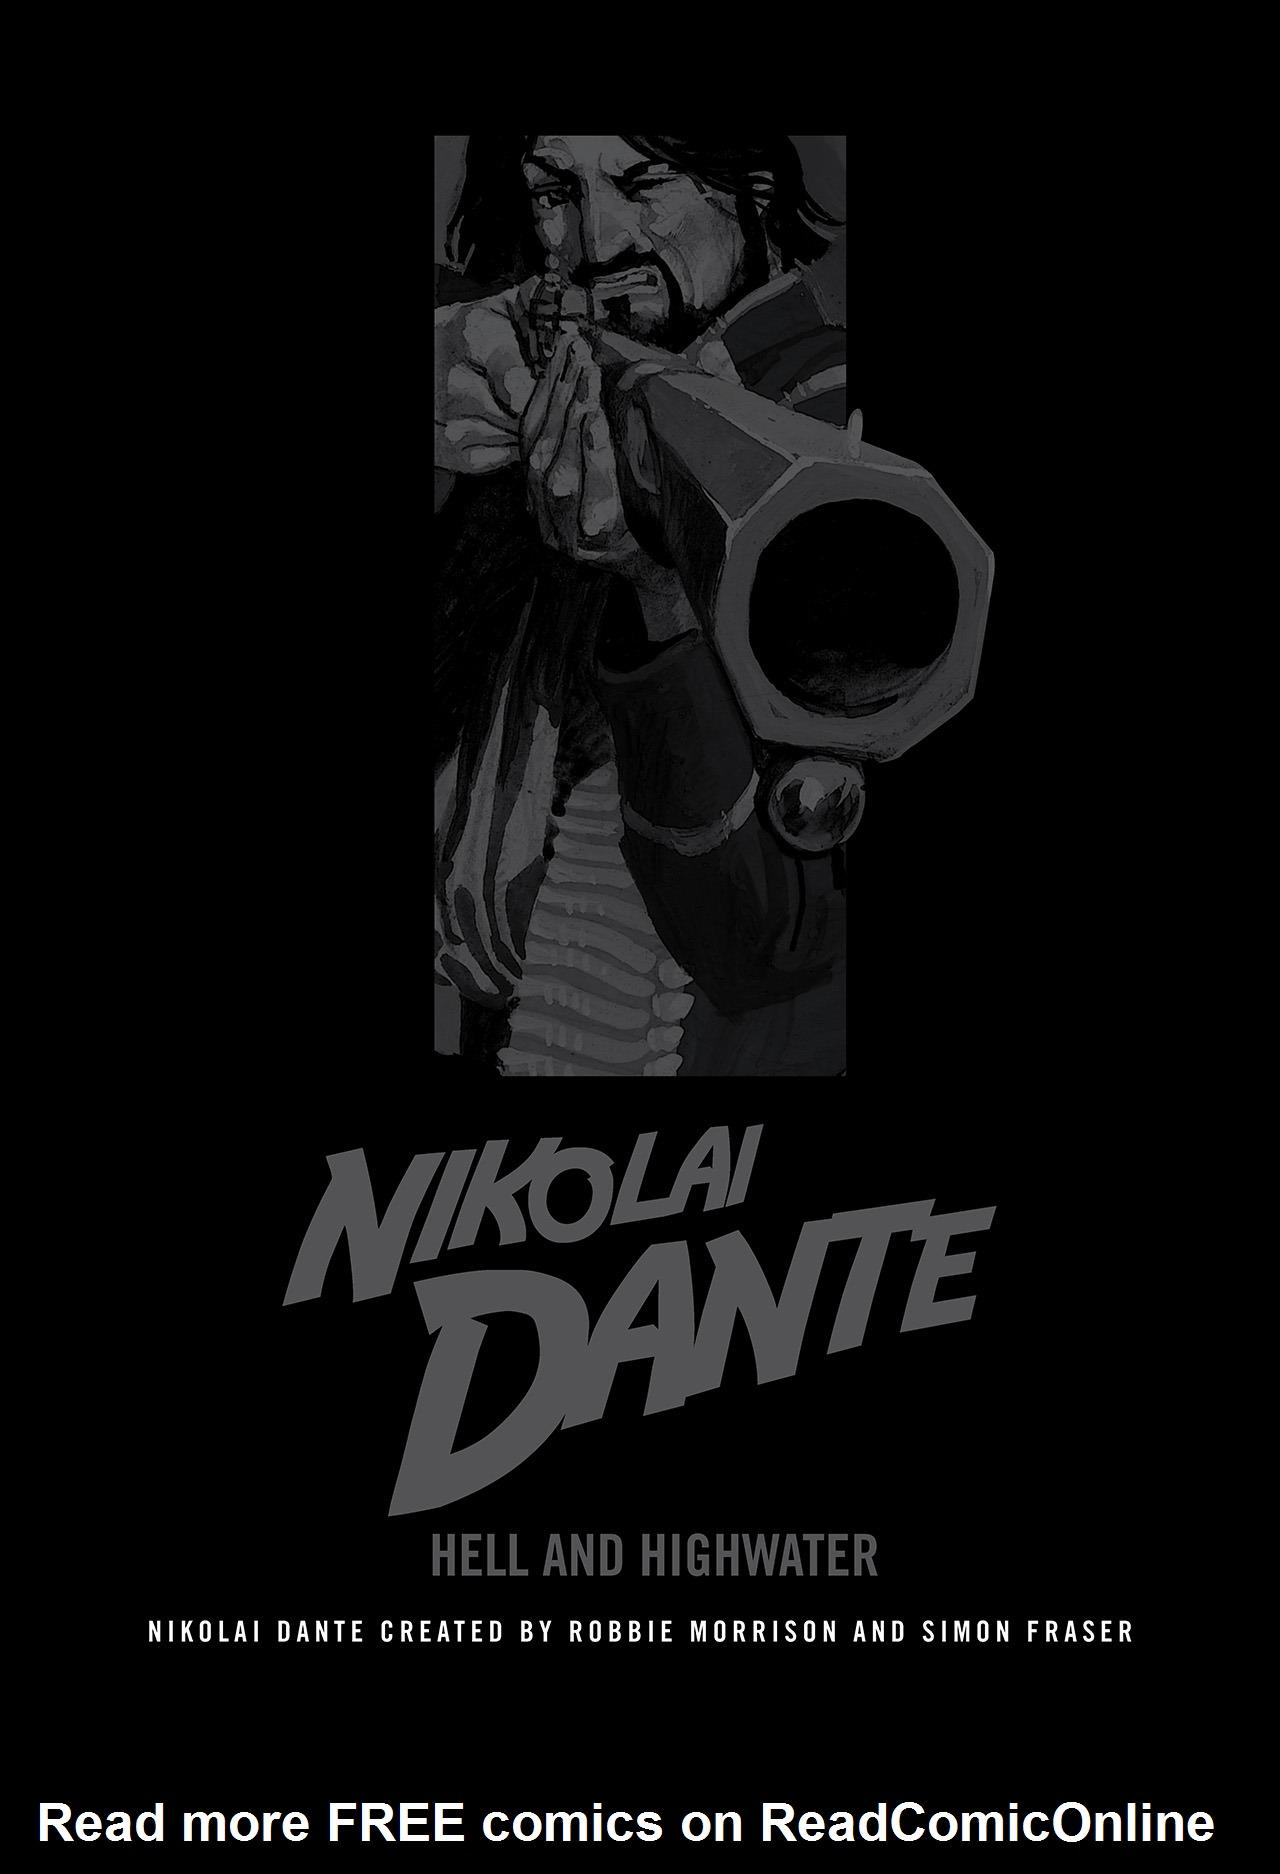 Read online Nikolai Dante comic -  Issue # TPB 6 - 3